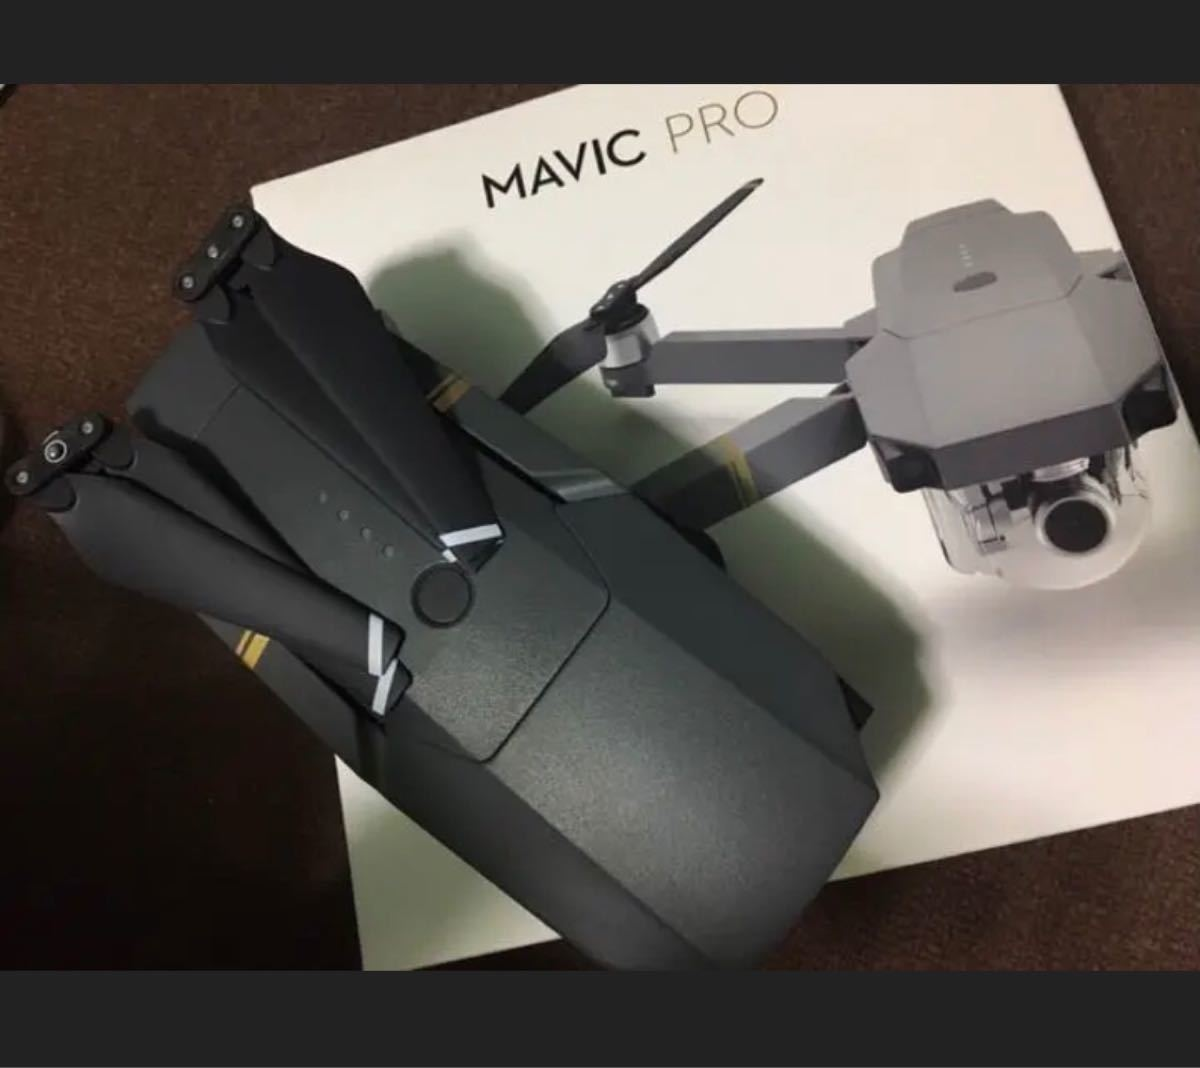 Mavic Pro ドローン